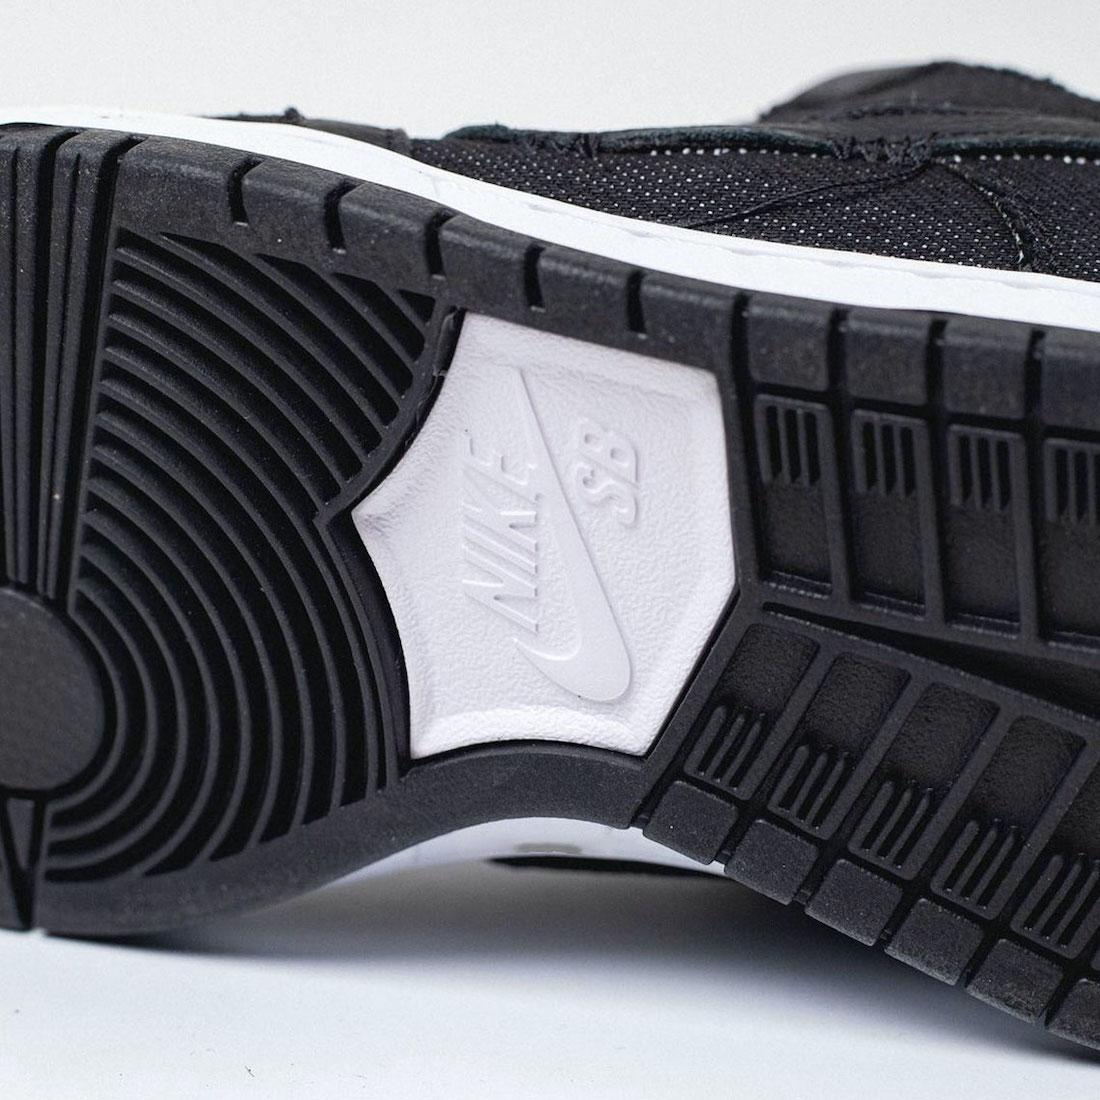 Dunk SB,Nike 将于 2021 年发售 朋克风格设计!全新联名 Nike Dunk SB 实物释出!